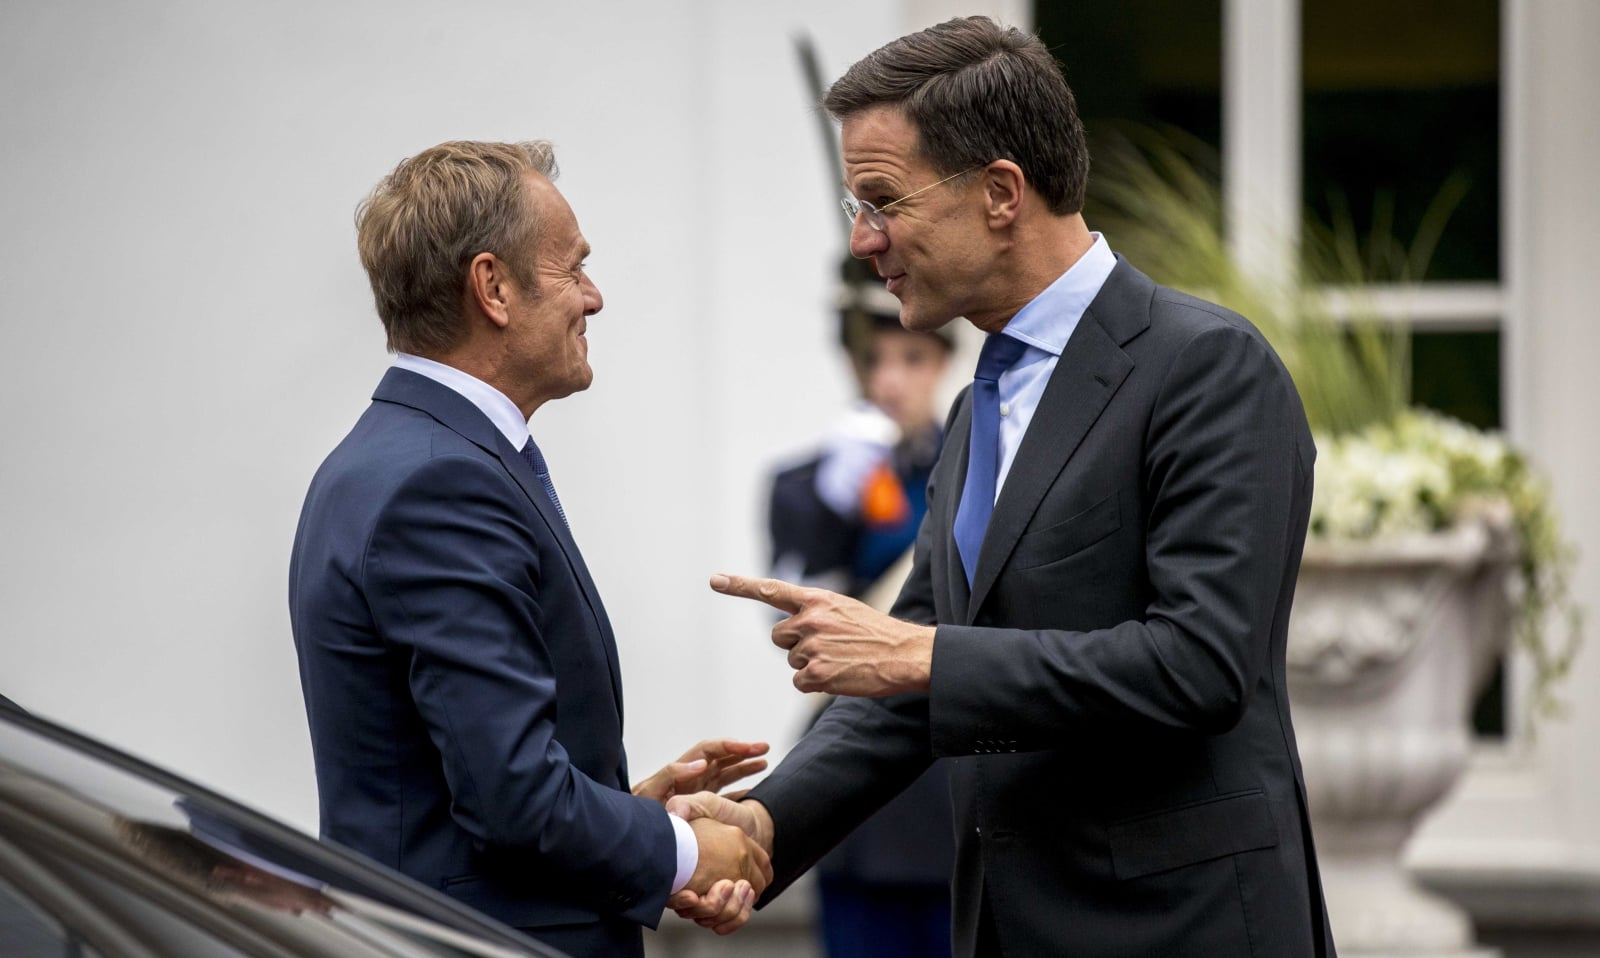 Spotkanie Donalda Tuska z premierem Holandii. fot. EPA/JERRY LAMPEN